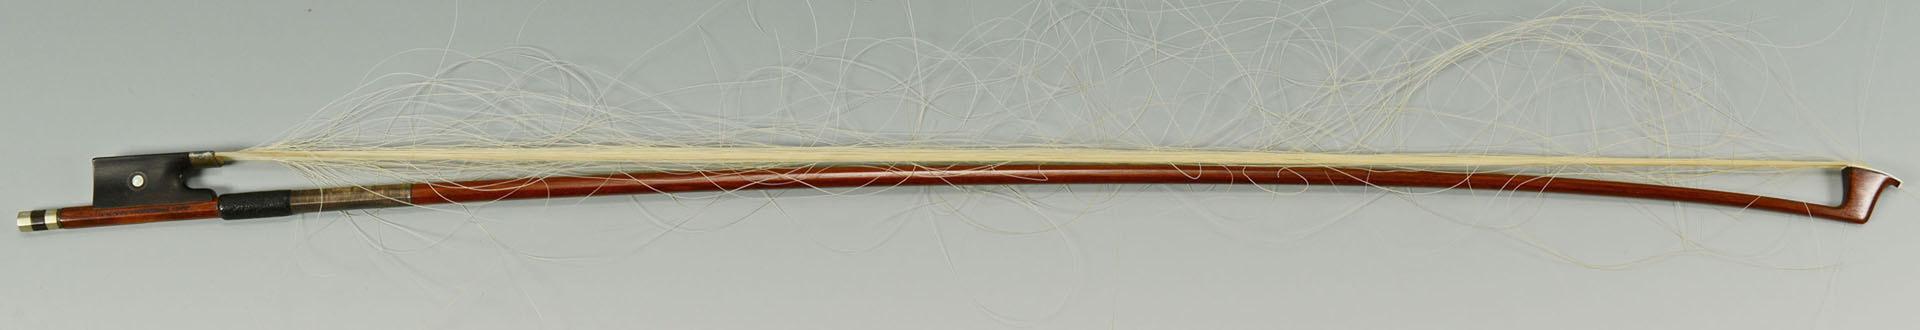 Lot 686: John Friedrich Violin bow